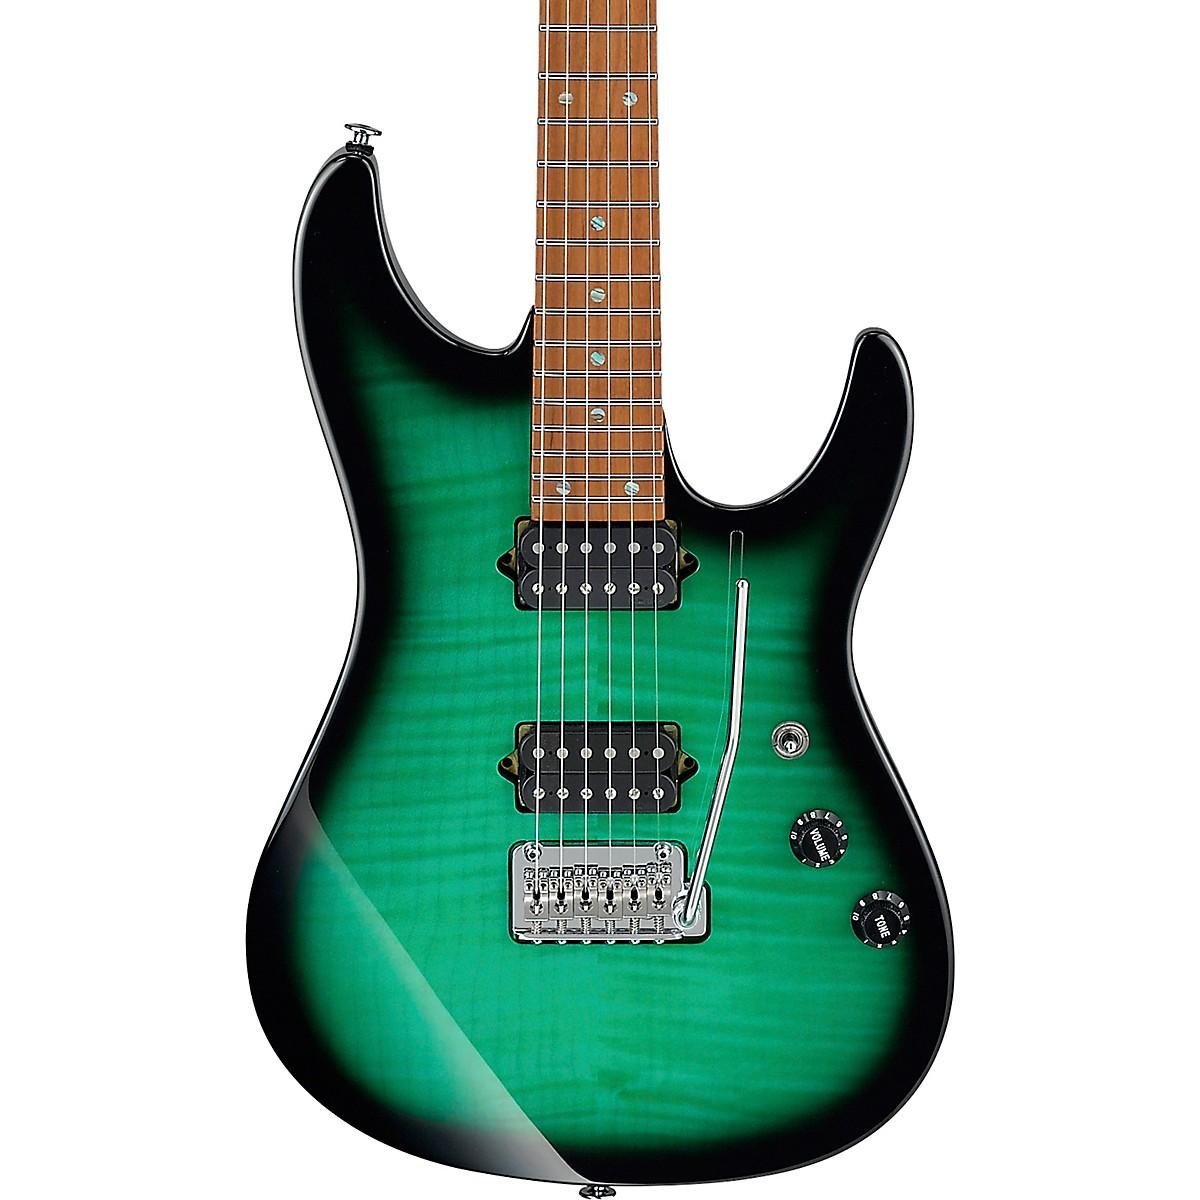 Ibanez MSM100 Marco Sfogli Signature Electric Guitar